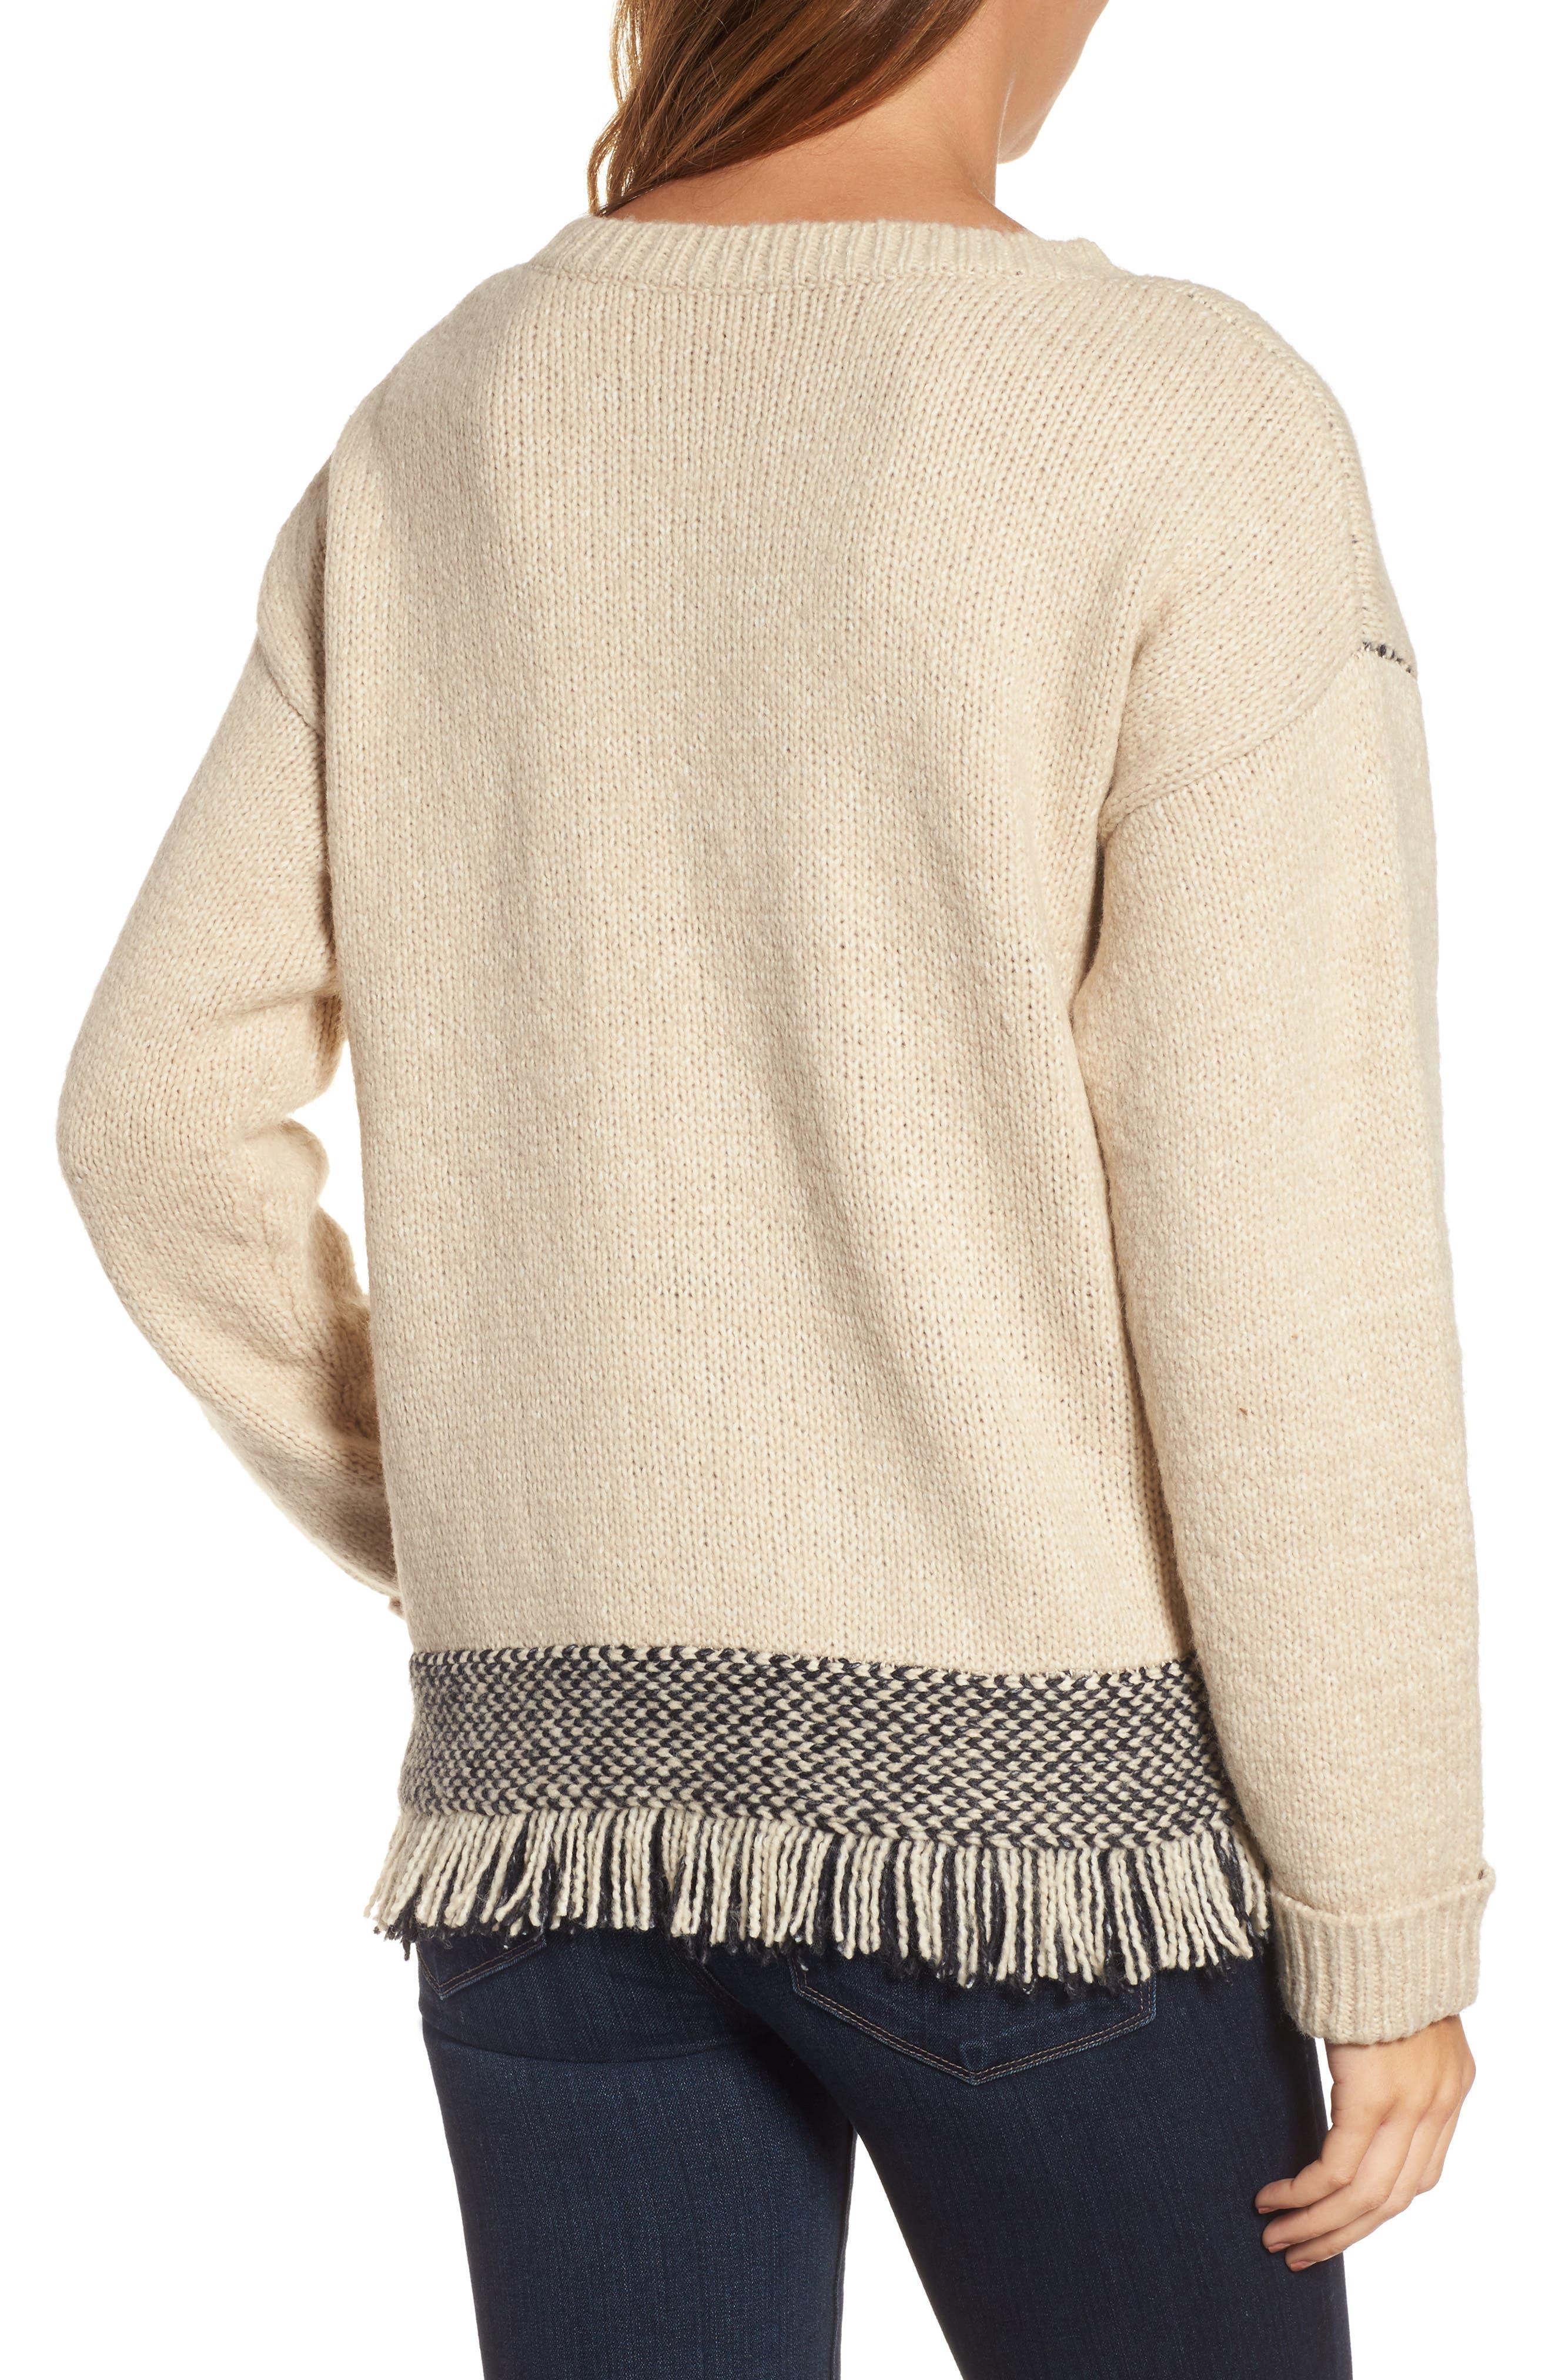 Fringe Sweater,                             Alternate thumbnail 2, color,                             Husked Tan